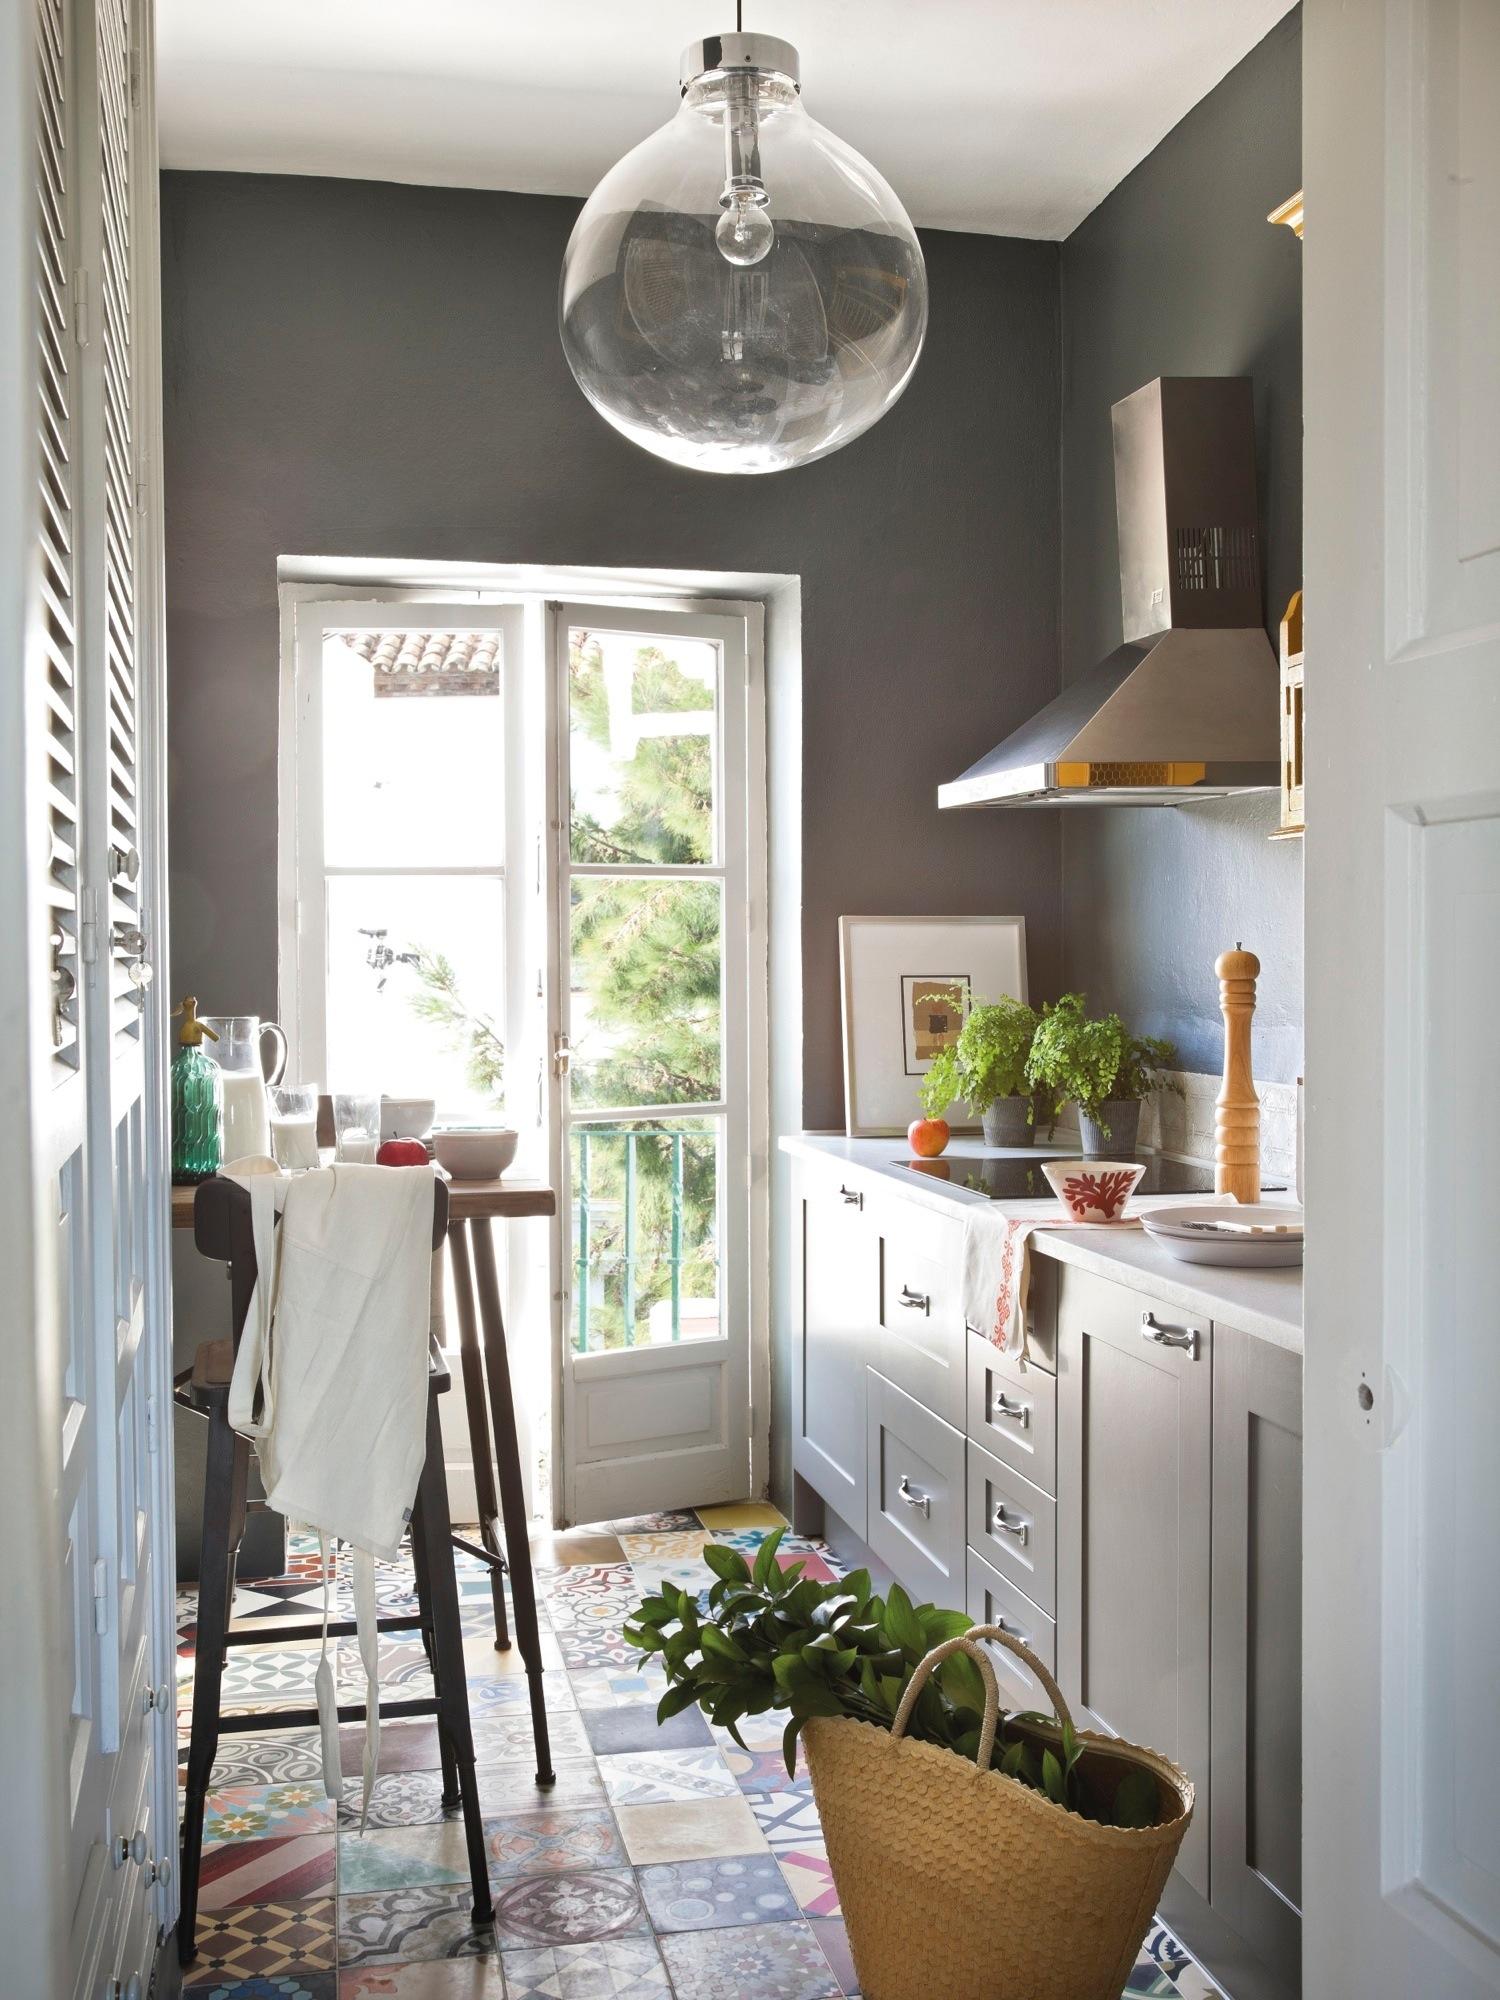 15 fotos de cocinas peque as bien aprovechadas for Cocinas modernas pequenas alargadas